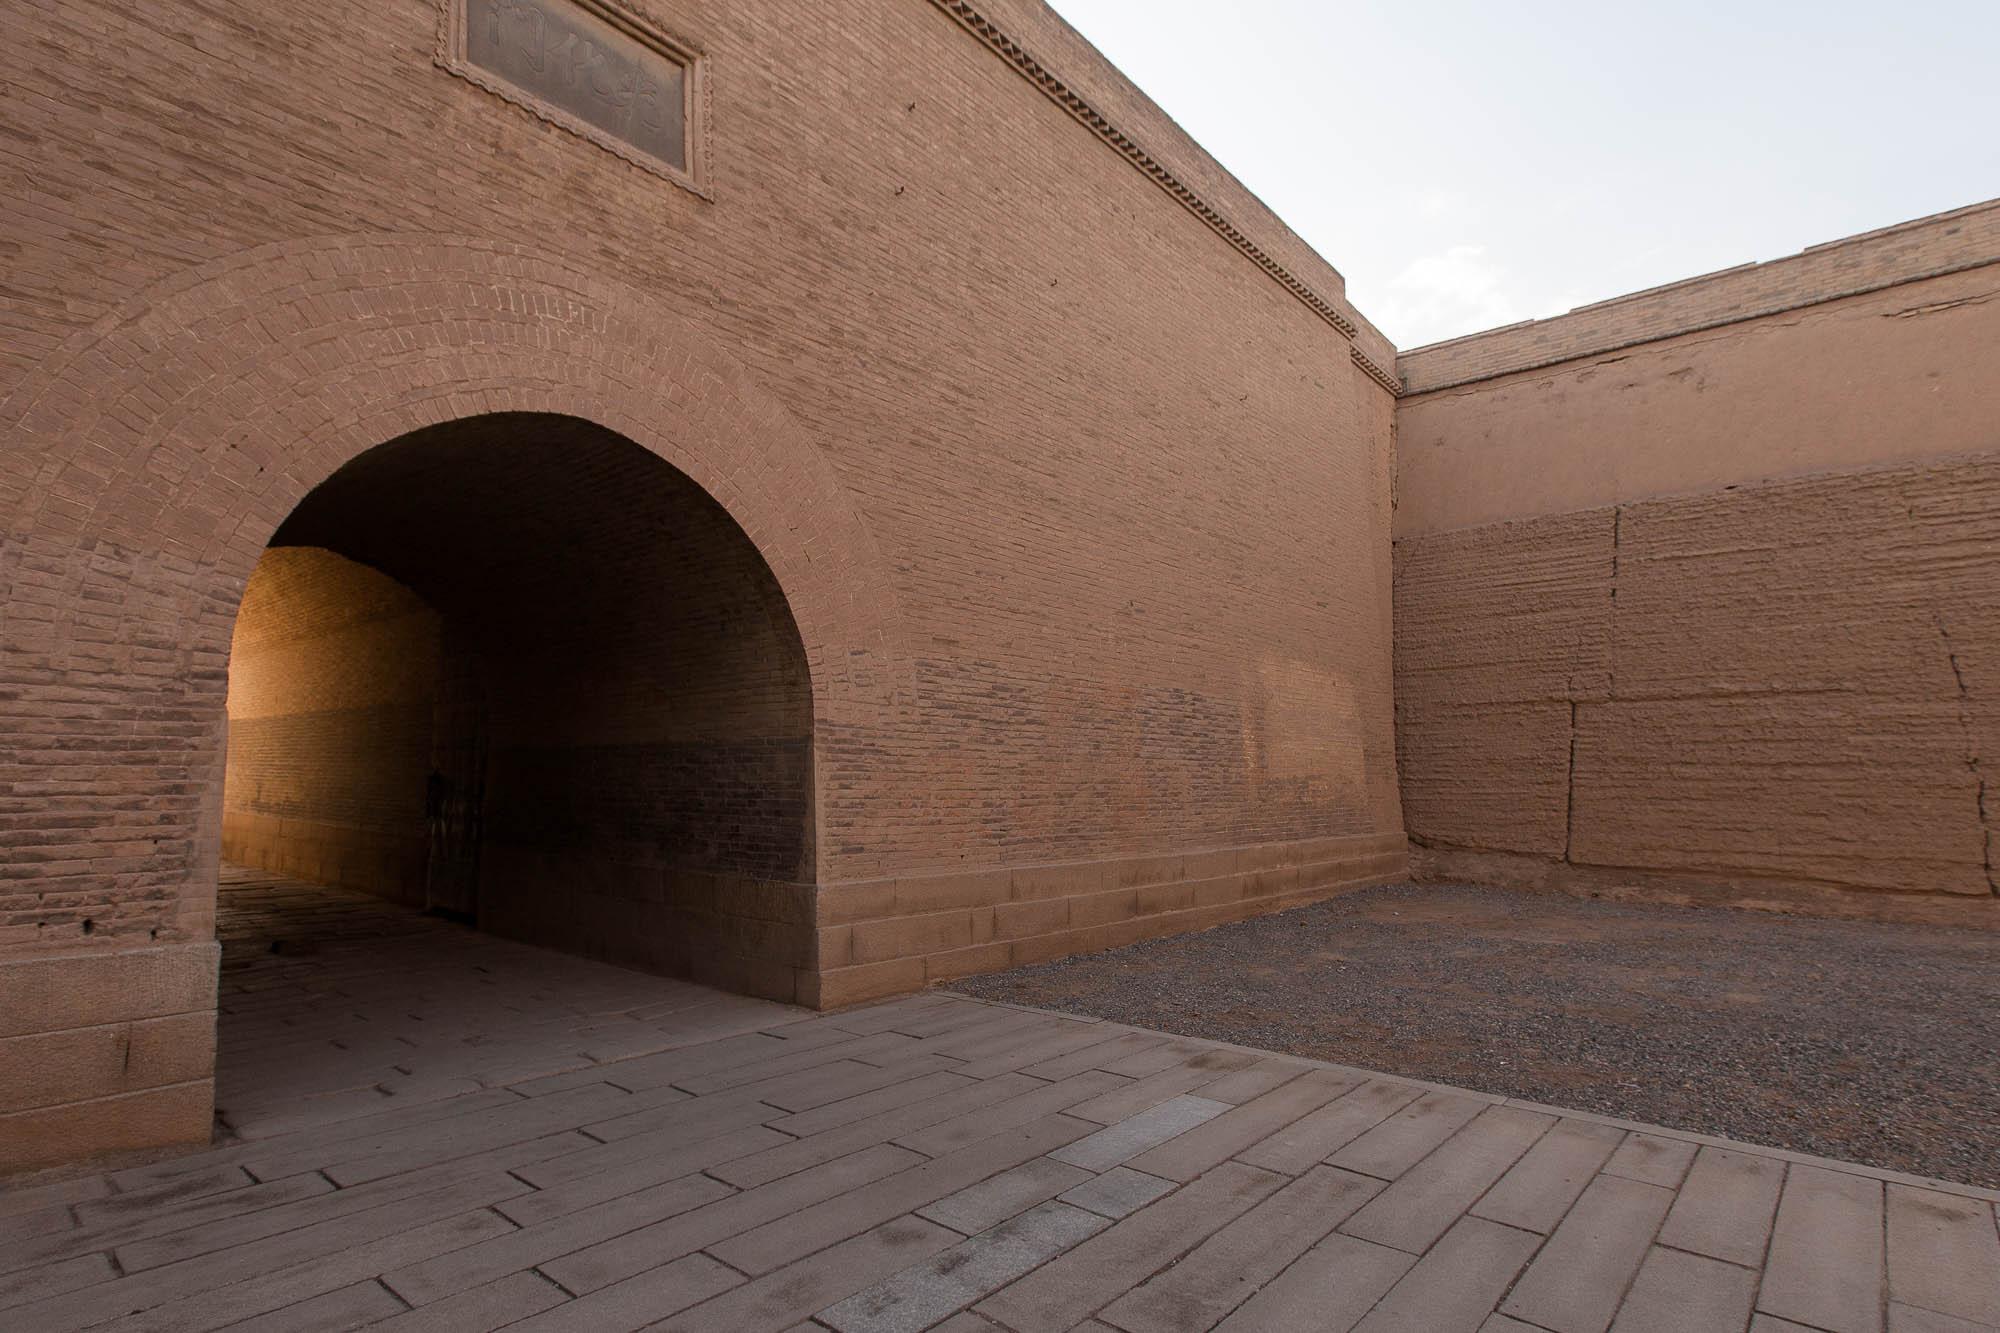 within Jiayuguan Fort